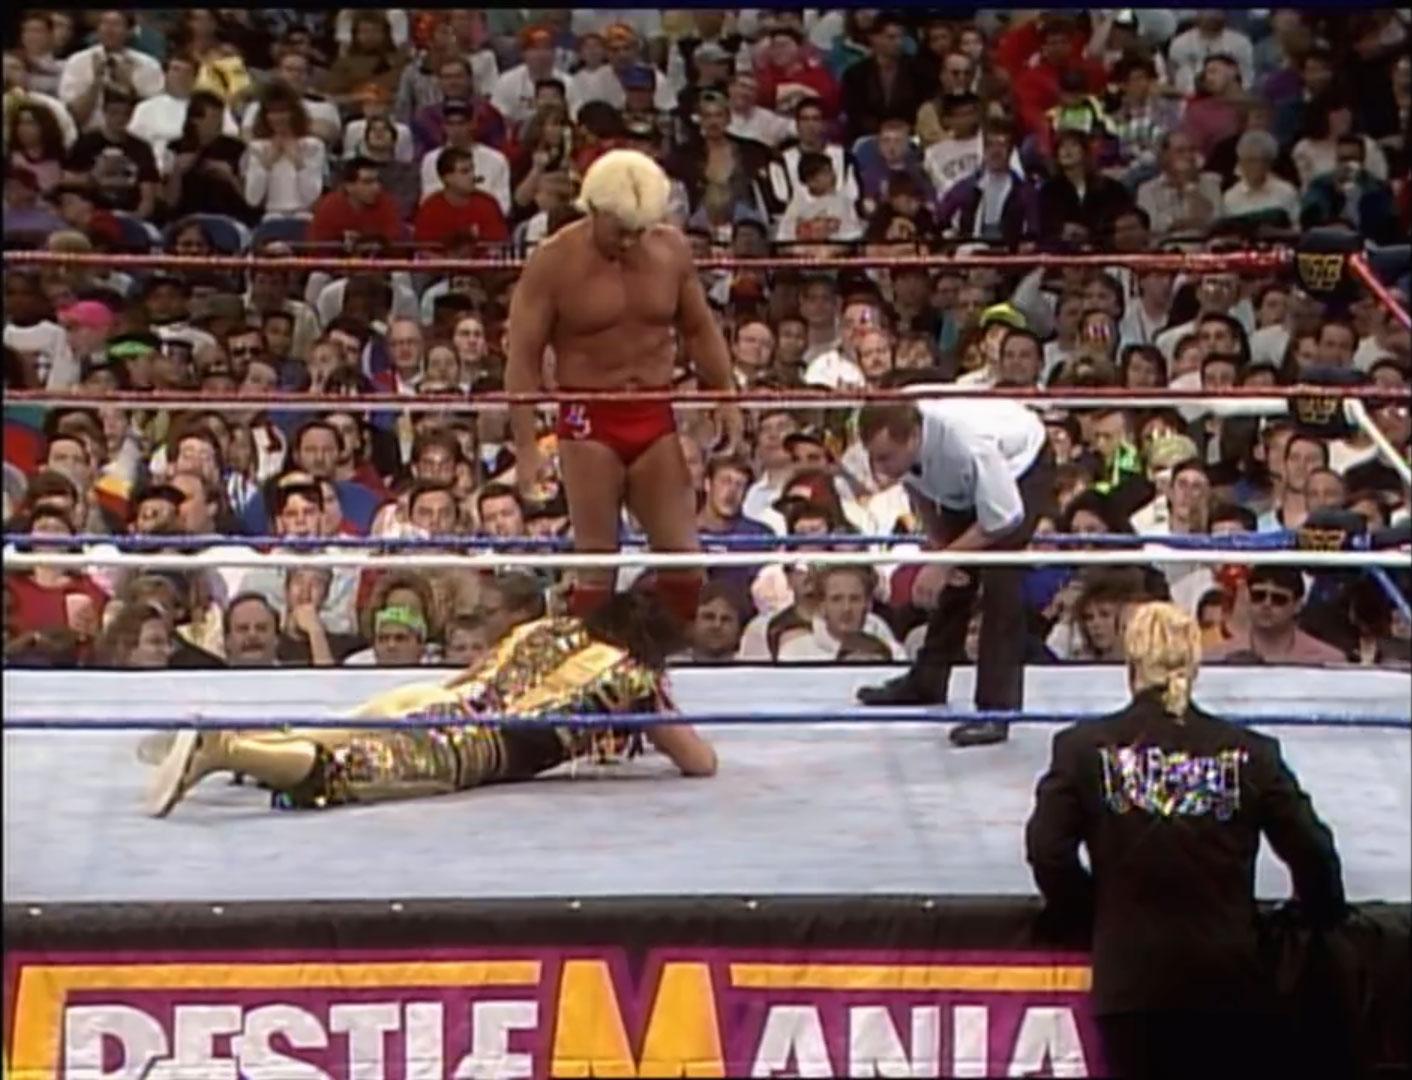 Randy Savage vs. Ric Flair WWF World Heavyweight Championship WWF WrestleMania VIII, Apr 5th 1992